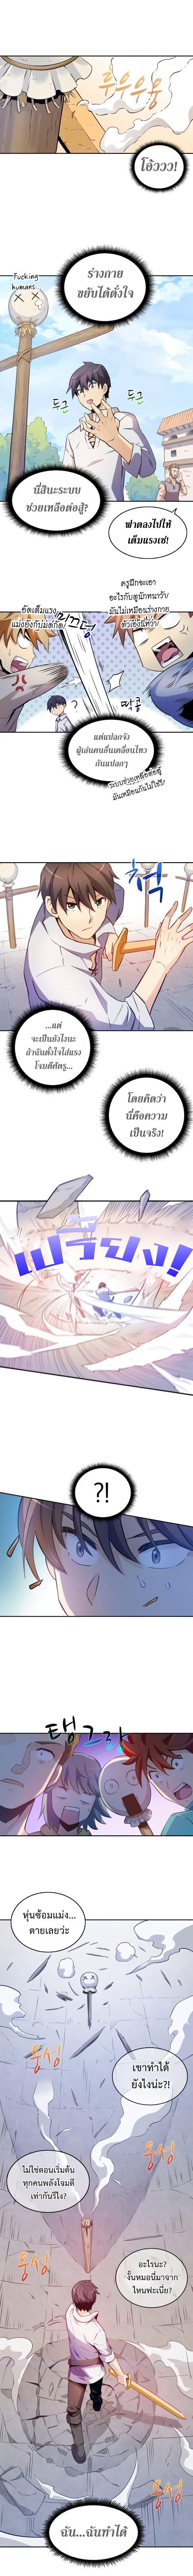 Arcane Sniper - หน้า 10